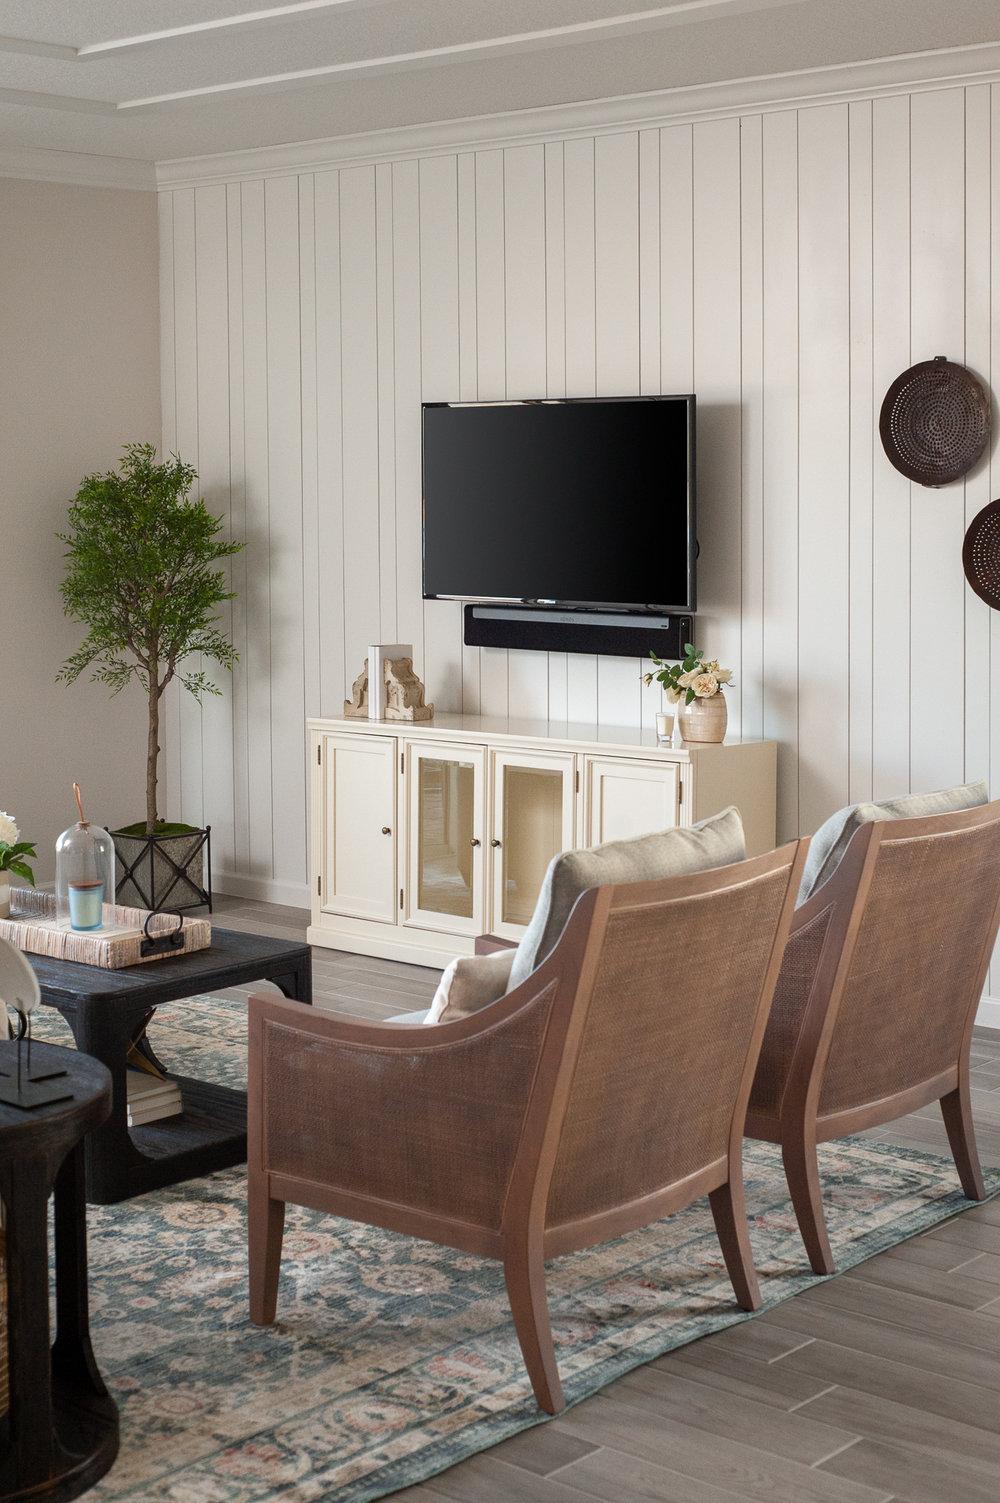 Micamy_Interior Designer_Design_Interior_Model_Merchandising_Living_Room_Entertainment_Traditional_Transitional_Shiplap_McGee & Co_Ballard_Rowe.jpg